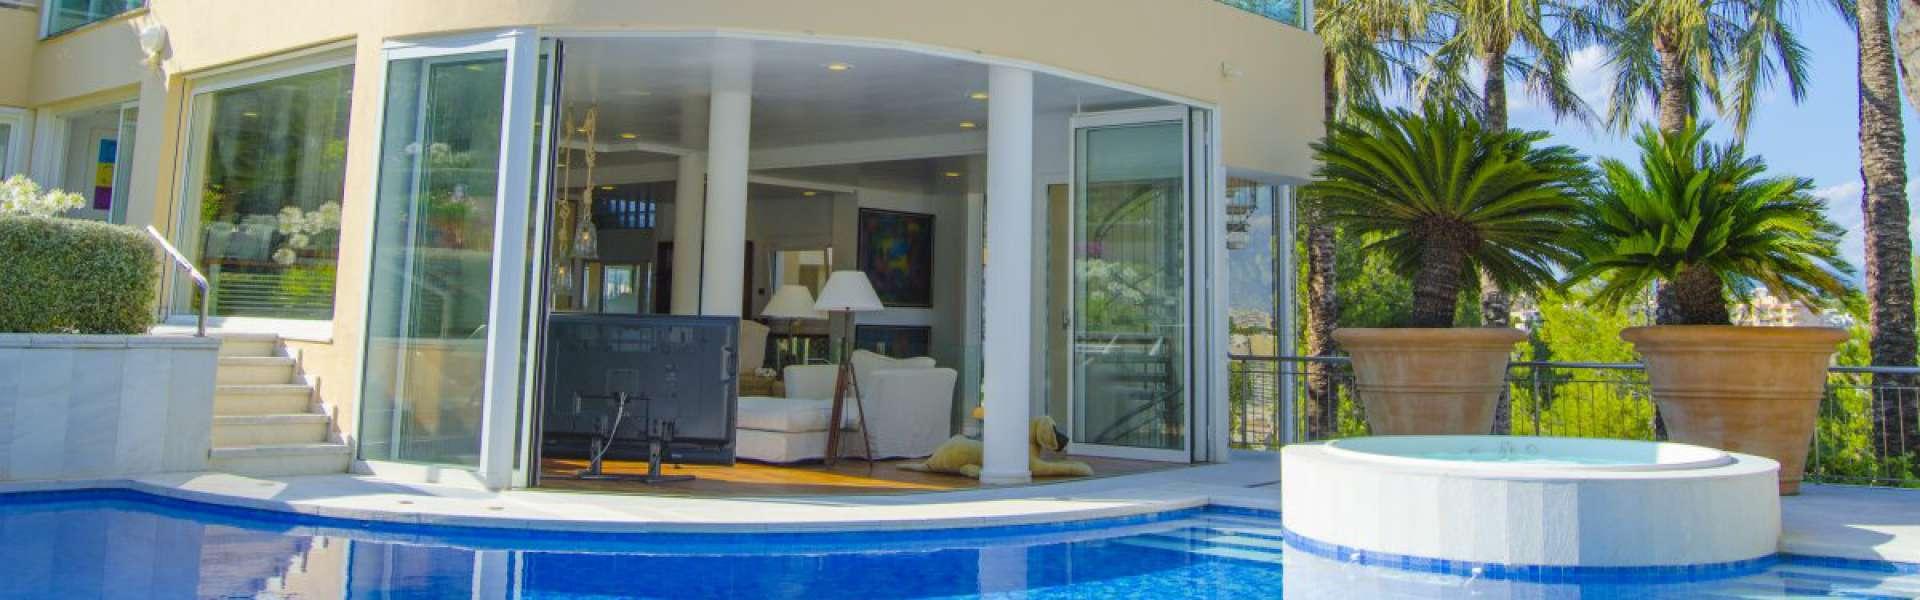 Cas Catala - Villa with sea views for sale